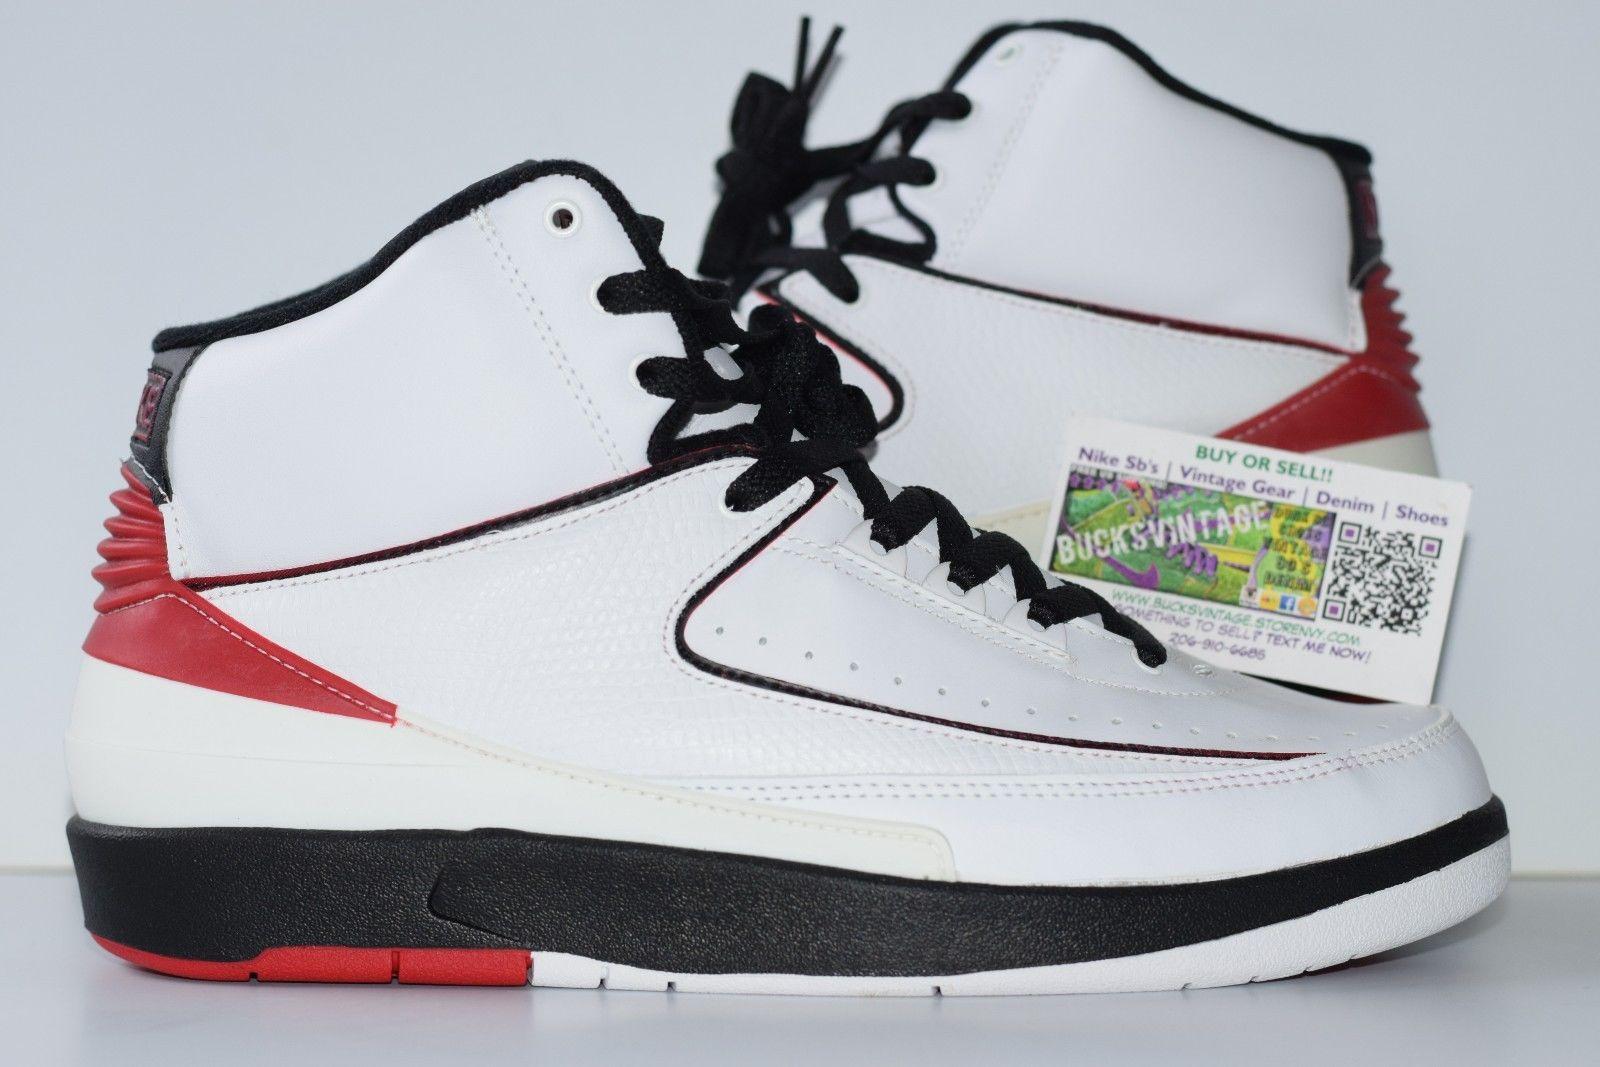 best sneakers 4e1af 078ee Size 9.5 | 2004 Retro Nike Air Jordan 2 OG 308308 161 white/varsity  red-black from BucksVintage